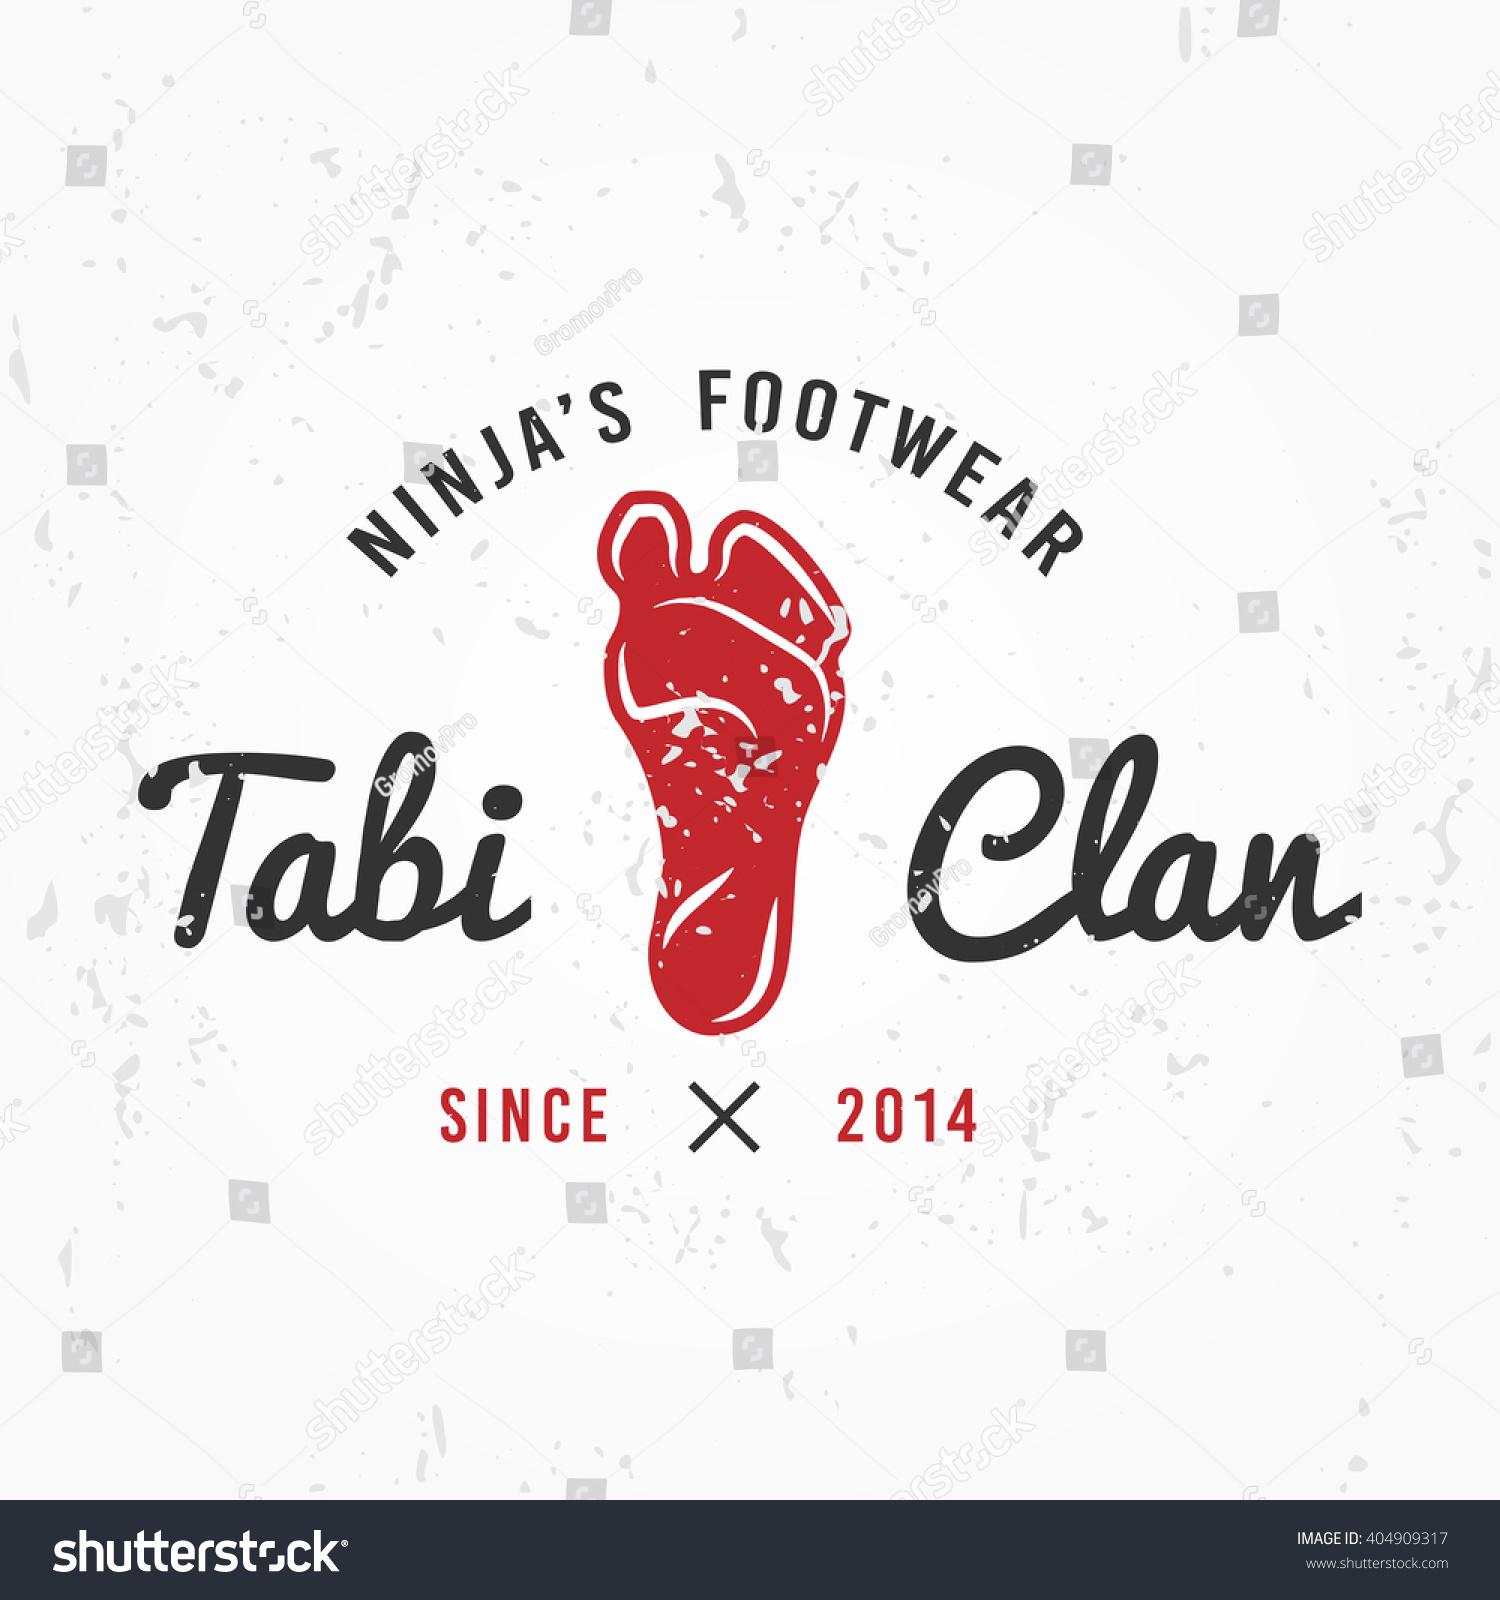 T shirt japanese design - Japanese Ninja Logo Footwear Insignia Design Vintage Tabi Foot Badge Martial Art Team